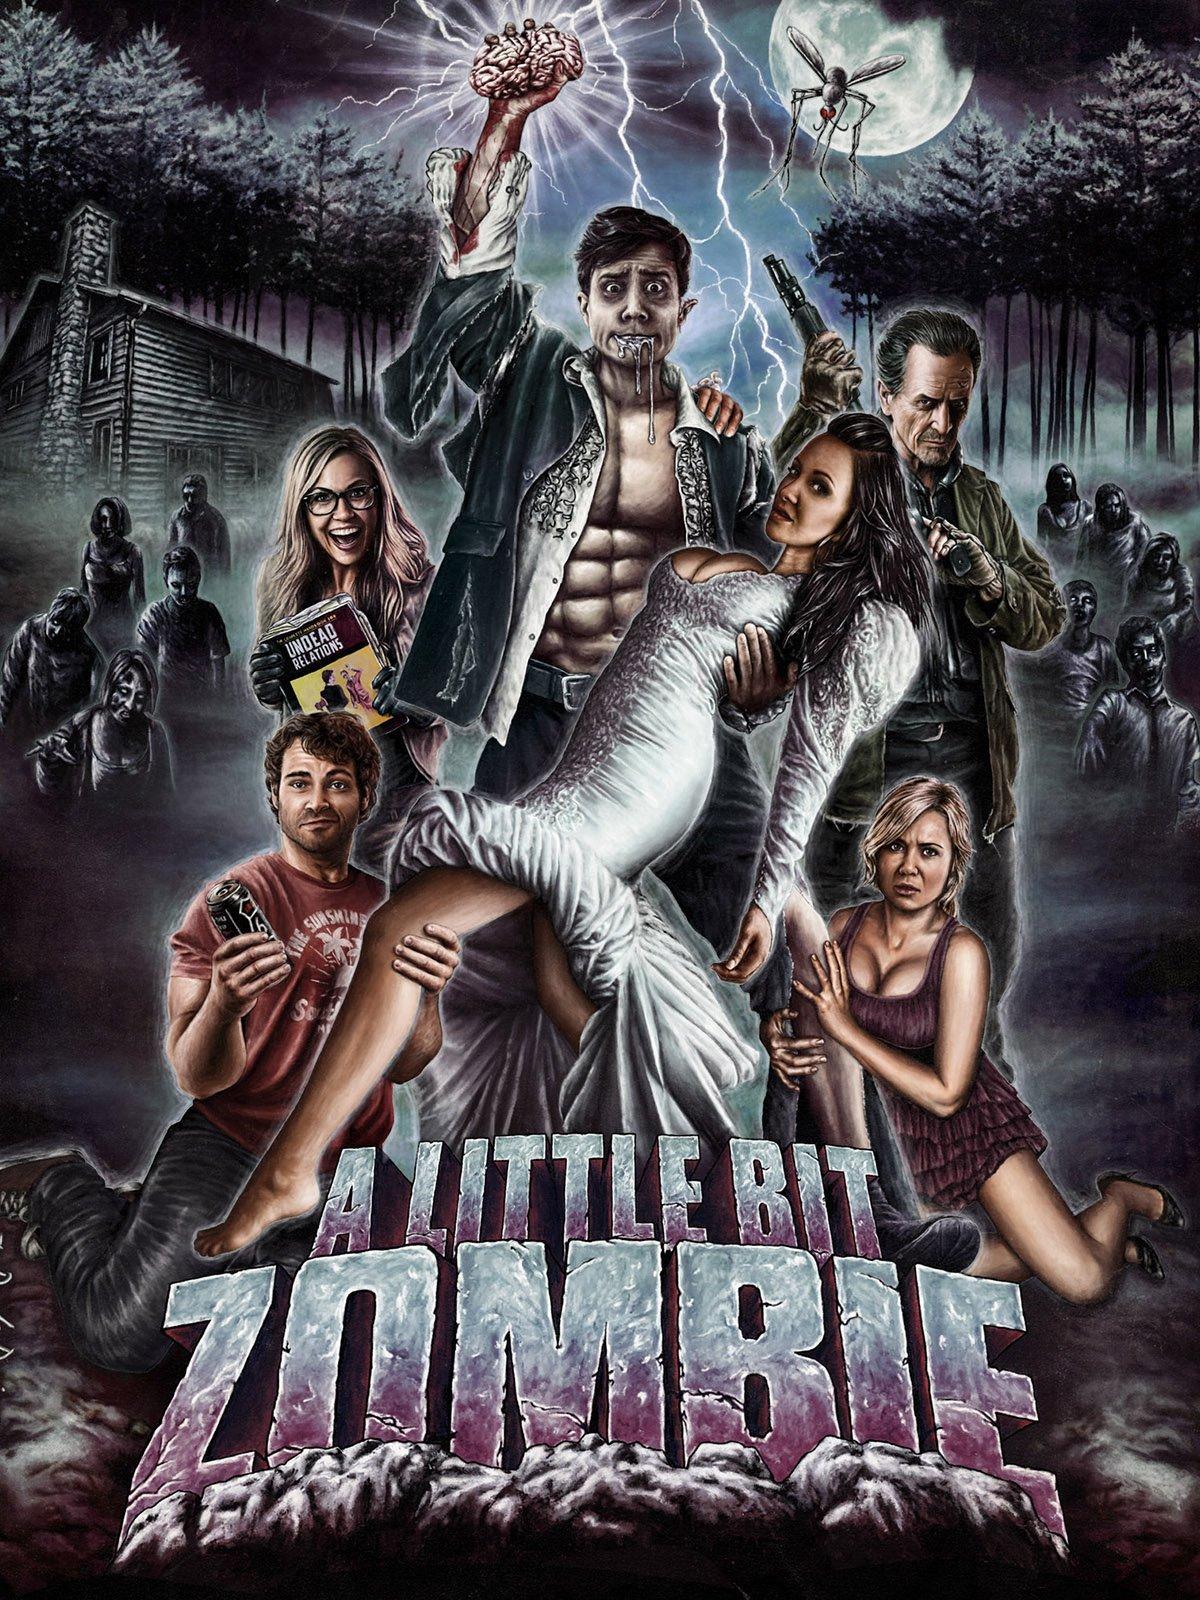 Amazon A Little Bit Zombie Crystal Lowe Shawn Roberts